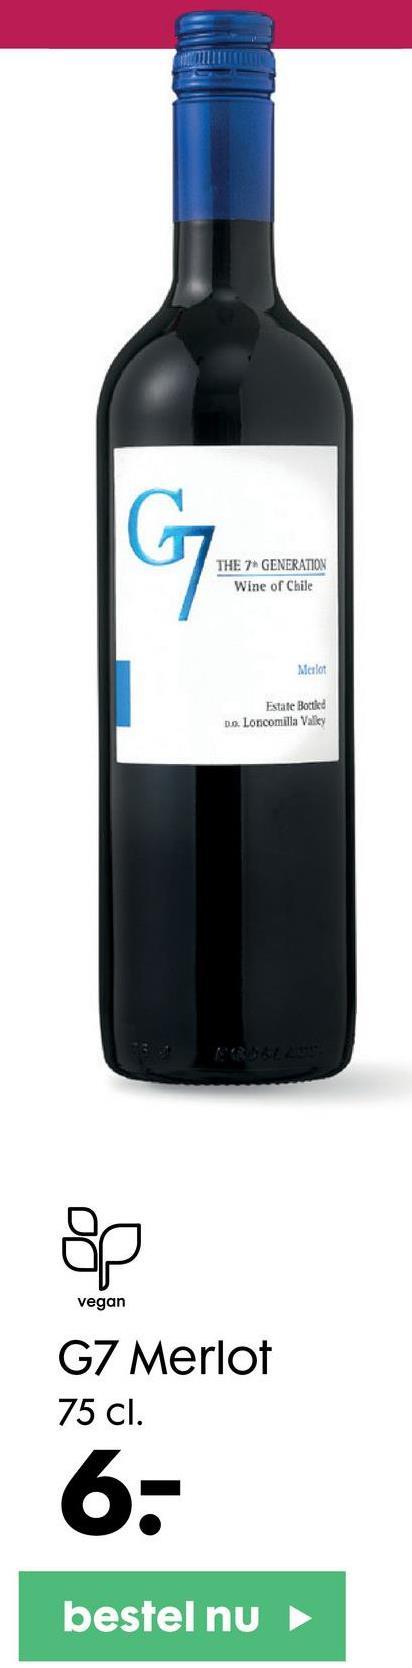 G THE 7 GENERATION Wine of Chile Merlot Estate Bottled Do Loncomilla Valley & 요 vegan G7 Merlot 75 cl. 6- bestel nu